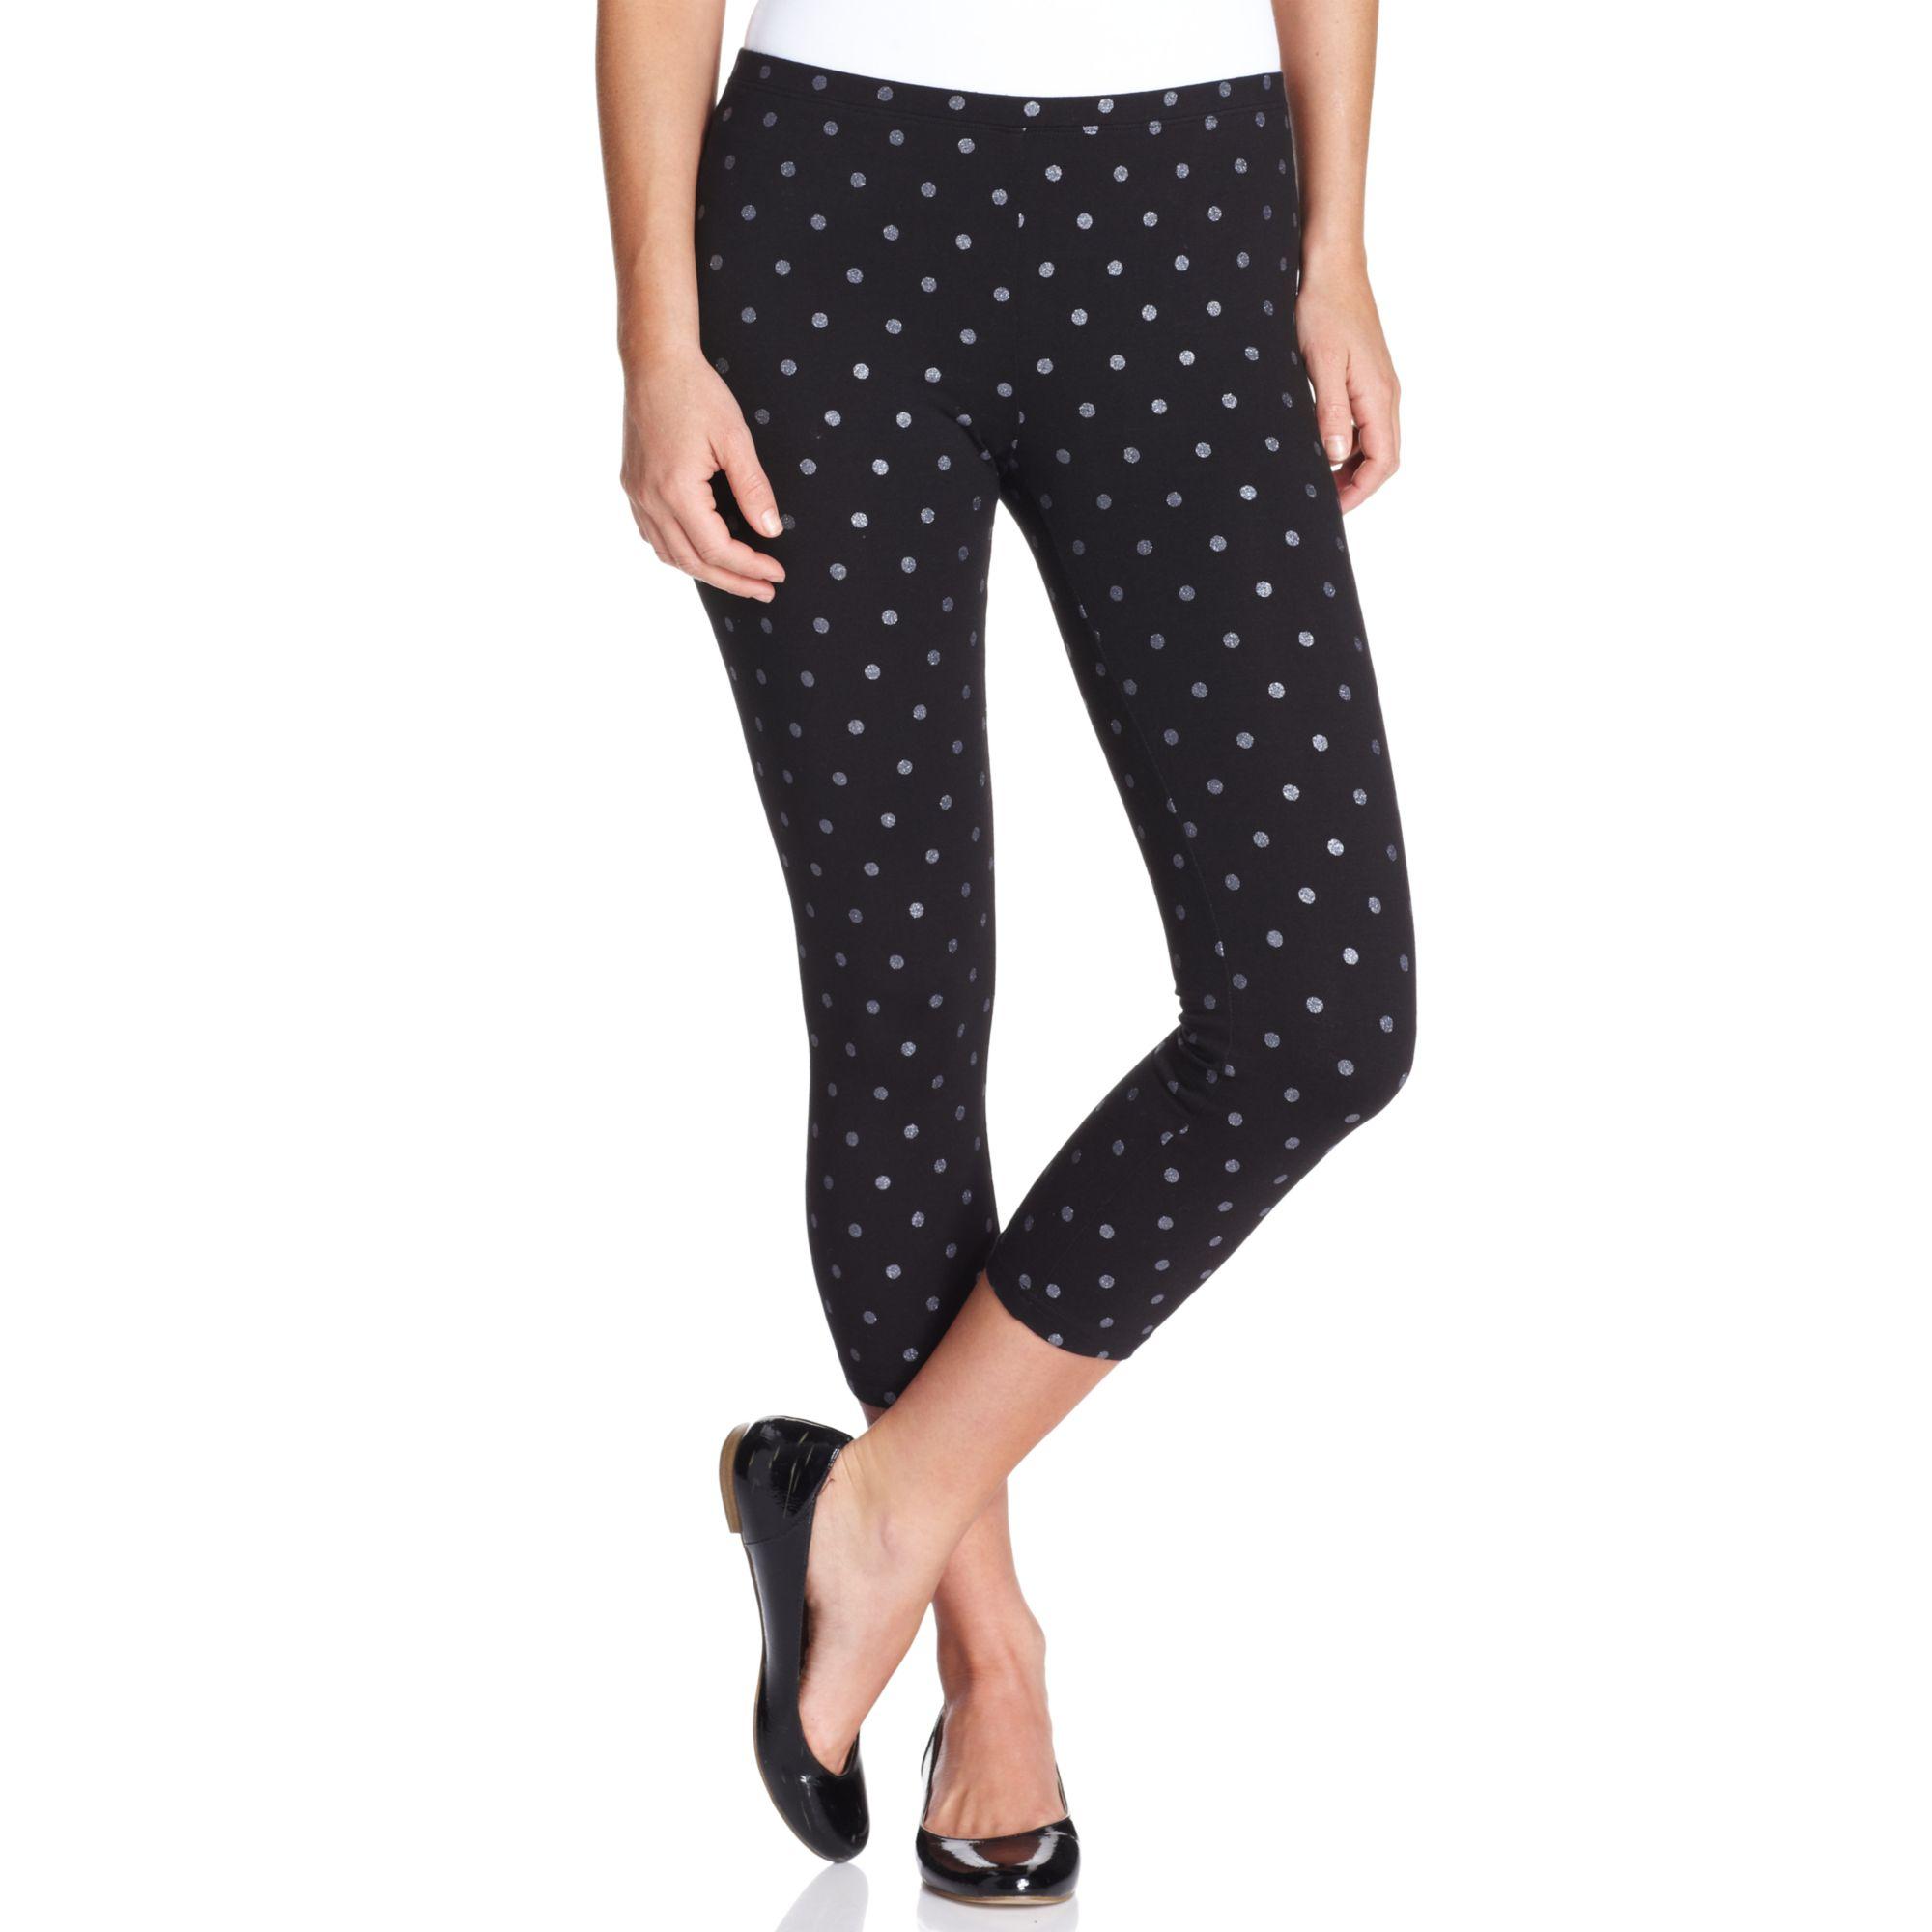 0a4e735c286e Lyst - Hue Glitter Dot Cotton Capri Leggings in Black